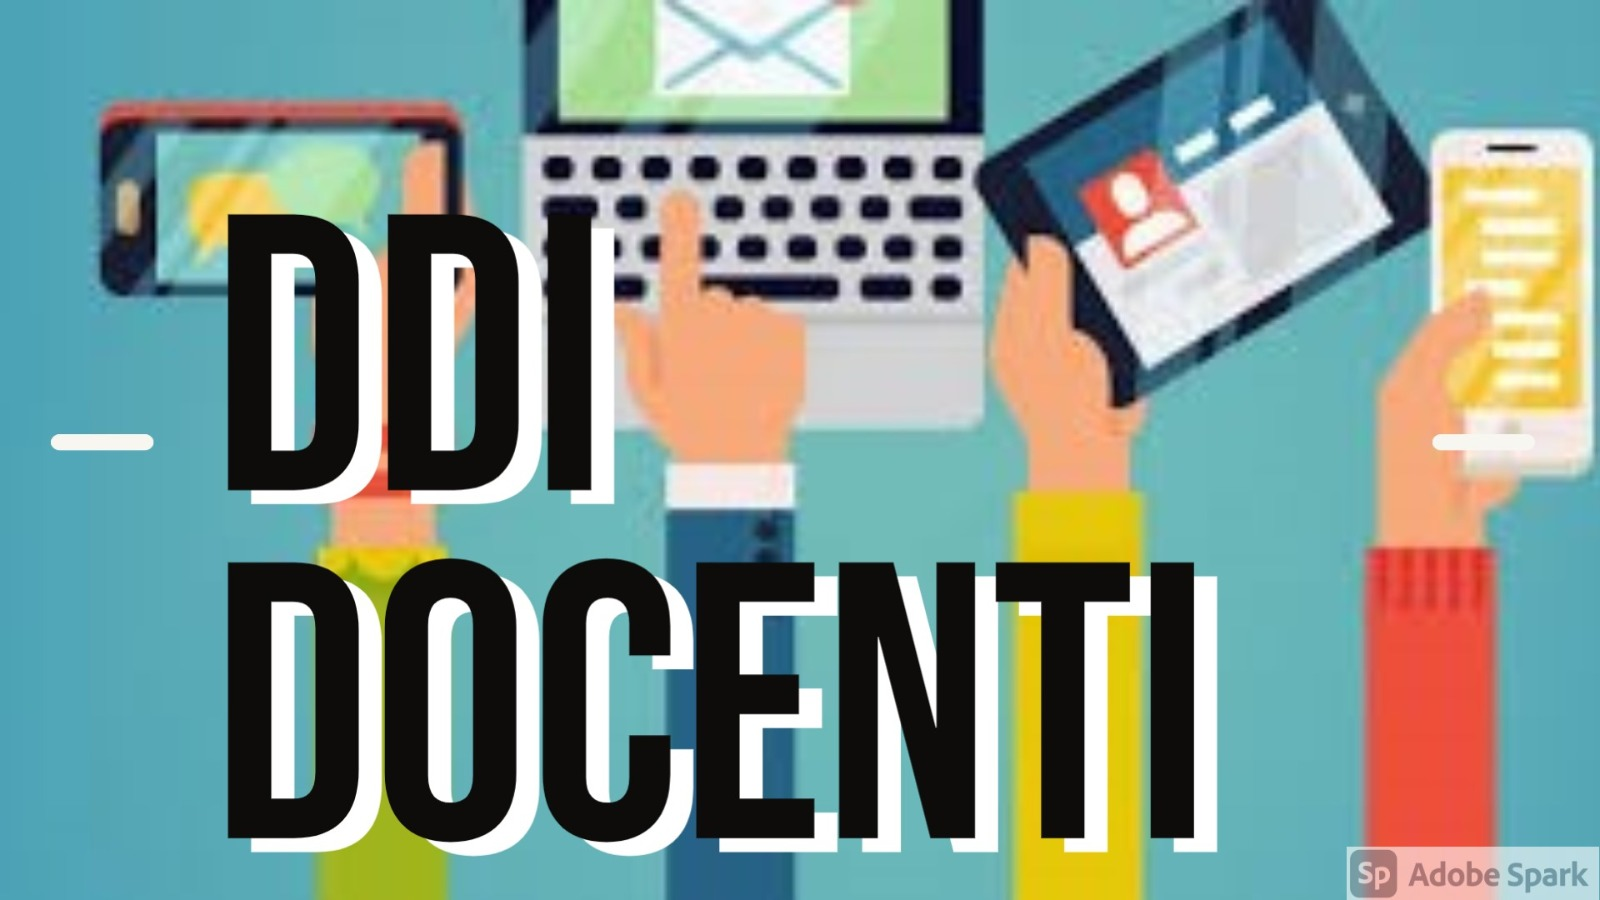 DDI Docenti